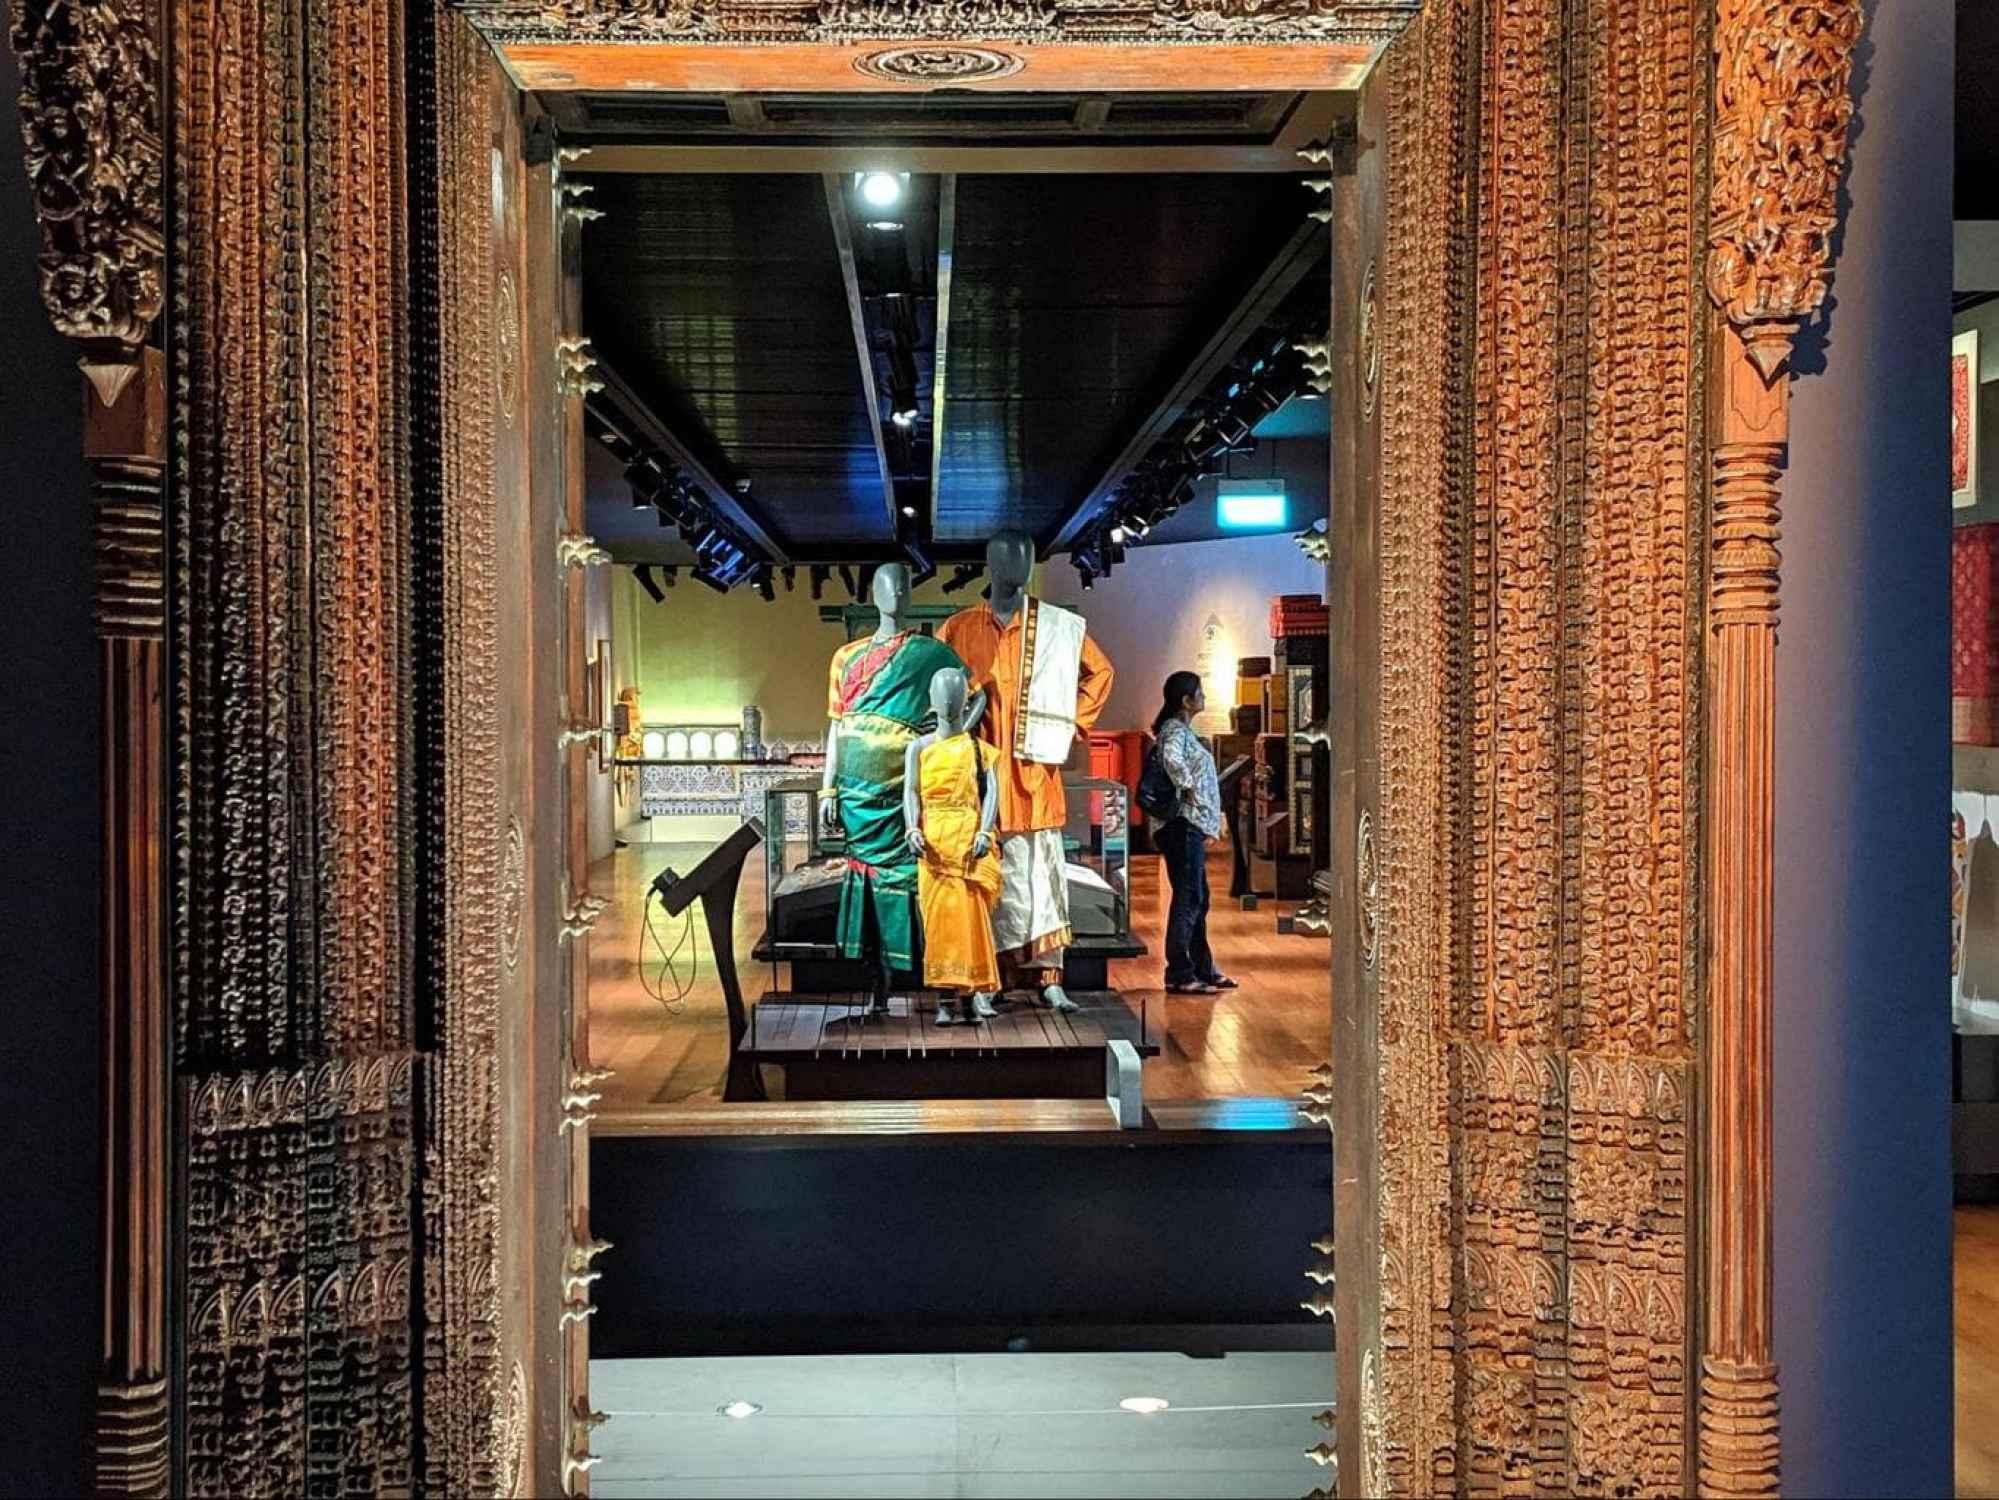 Indian Heritage Center display